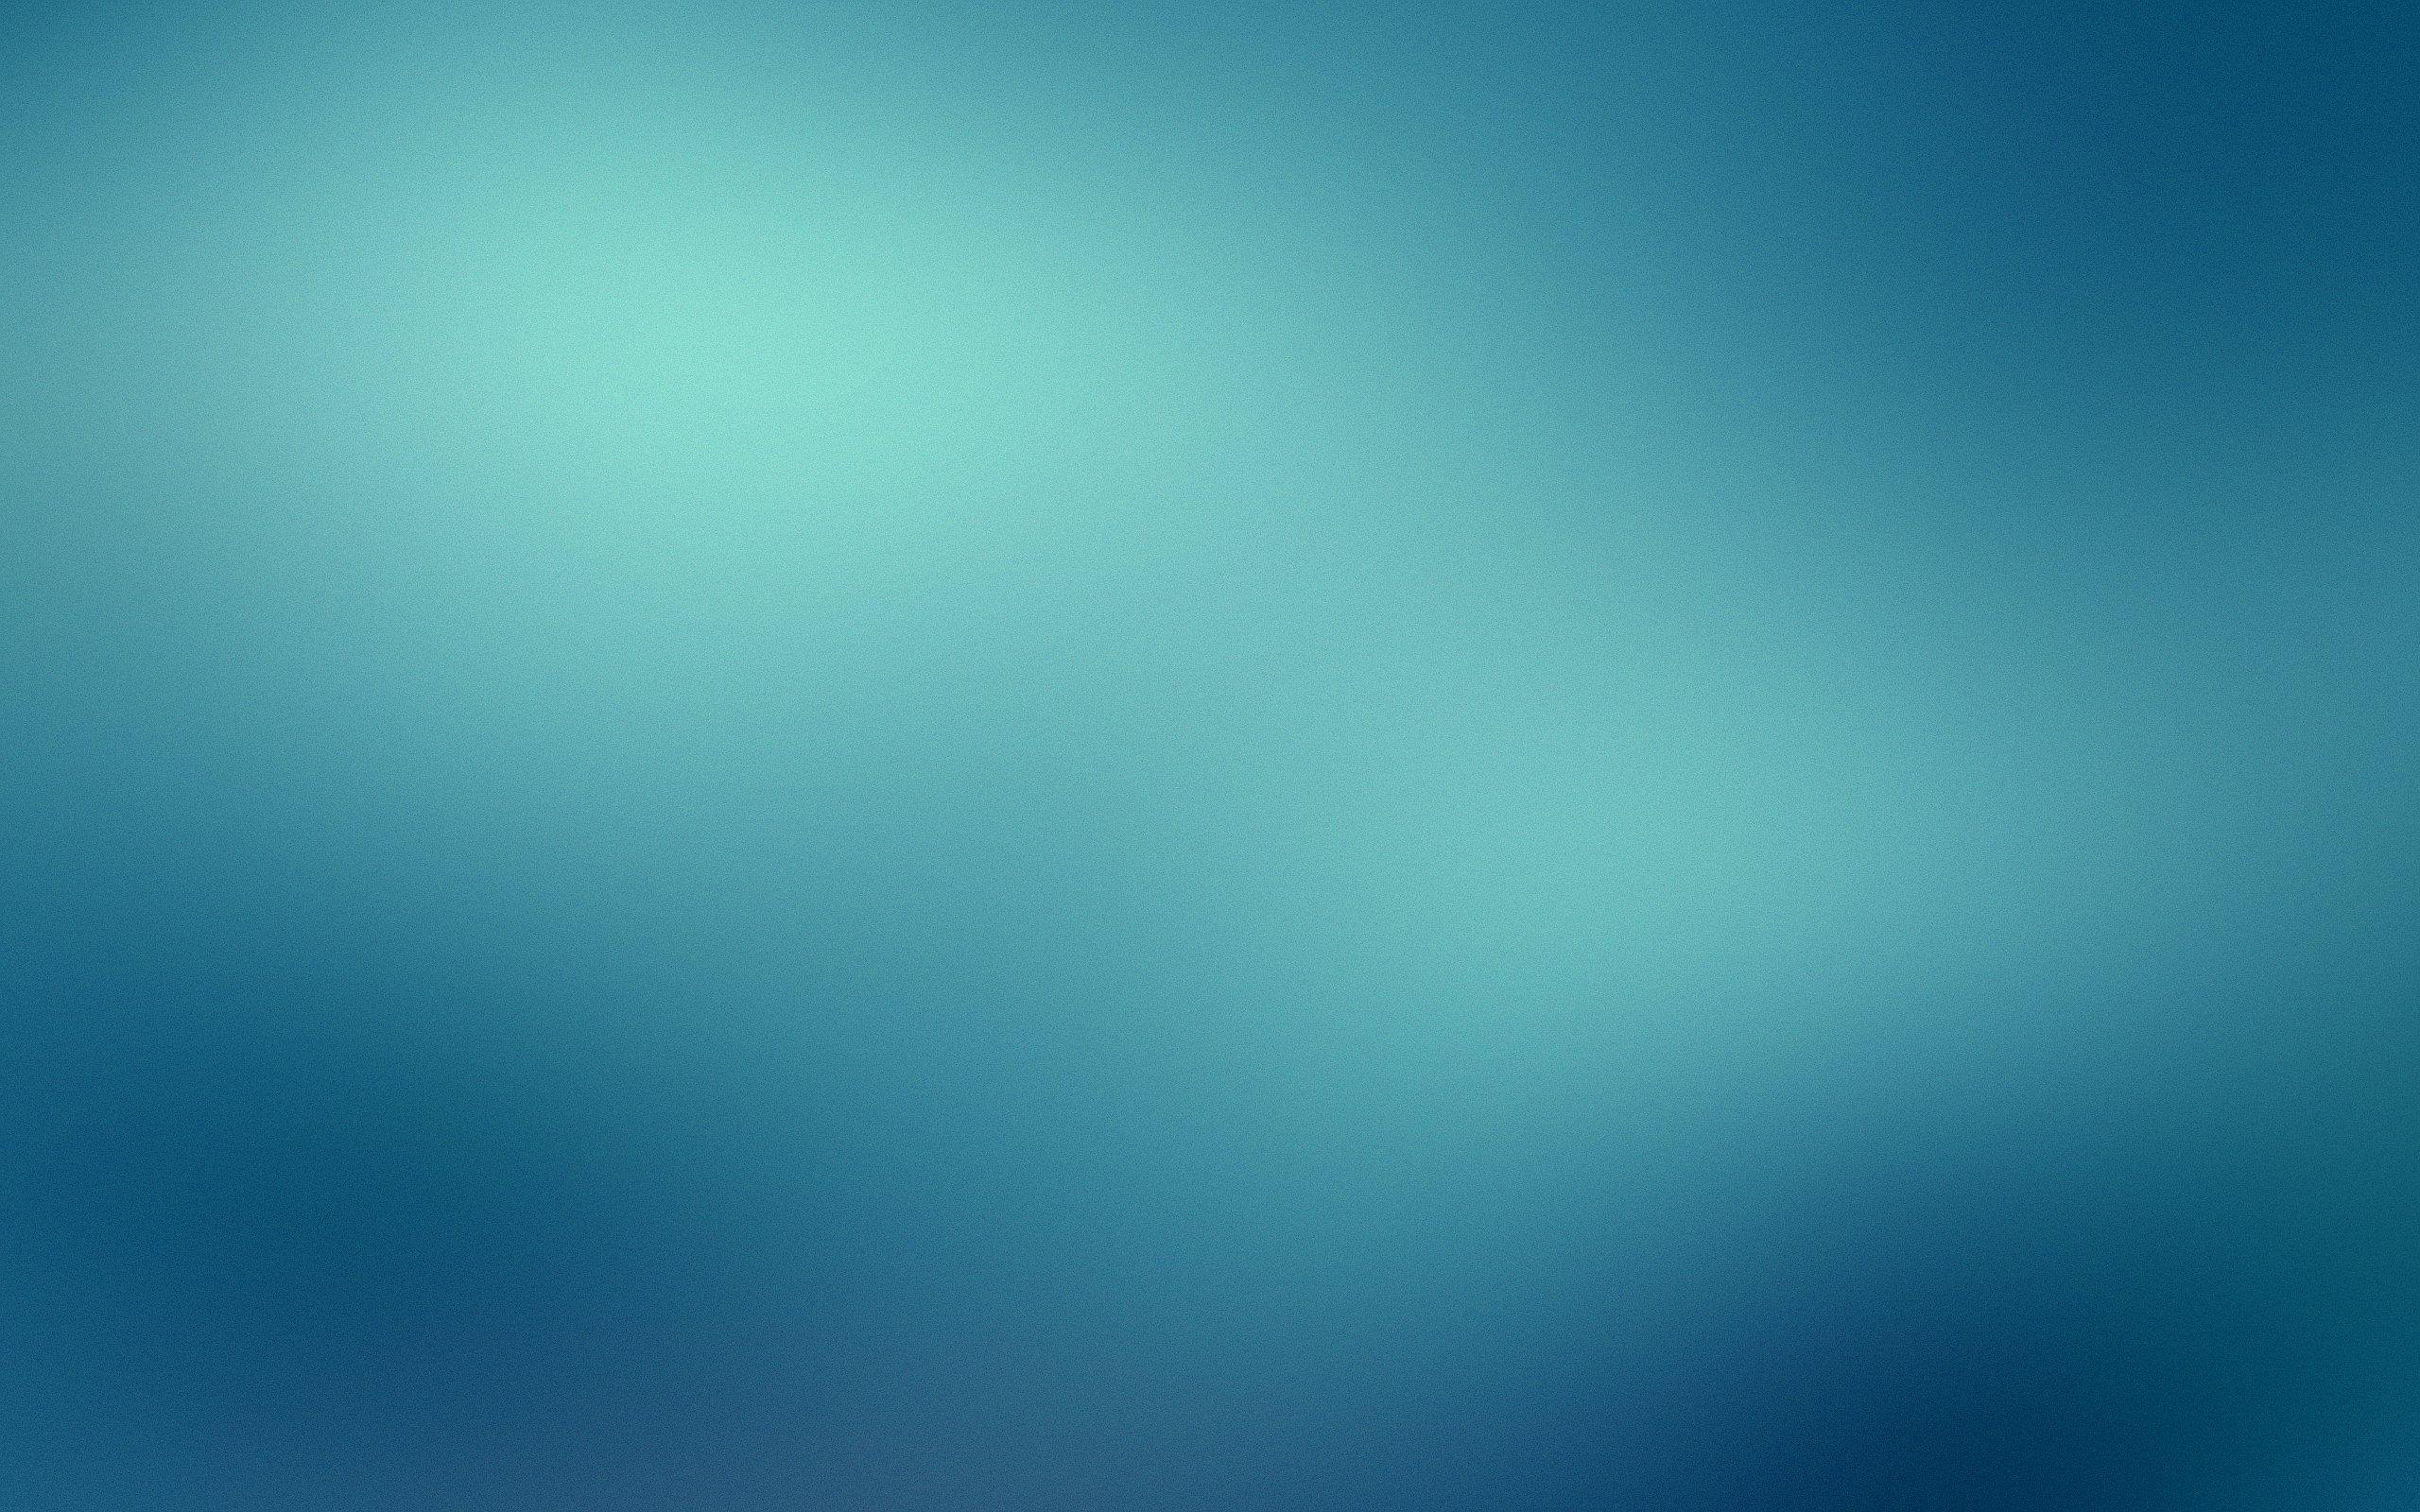 wallpaper-242789-3223143-3-8109527